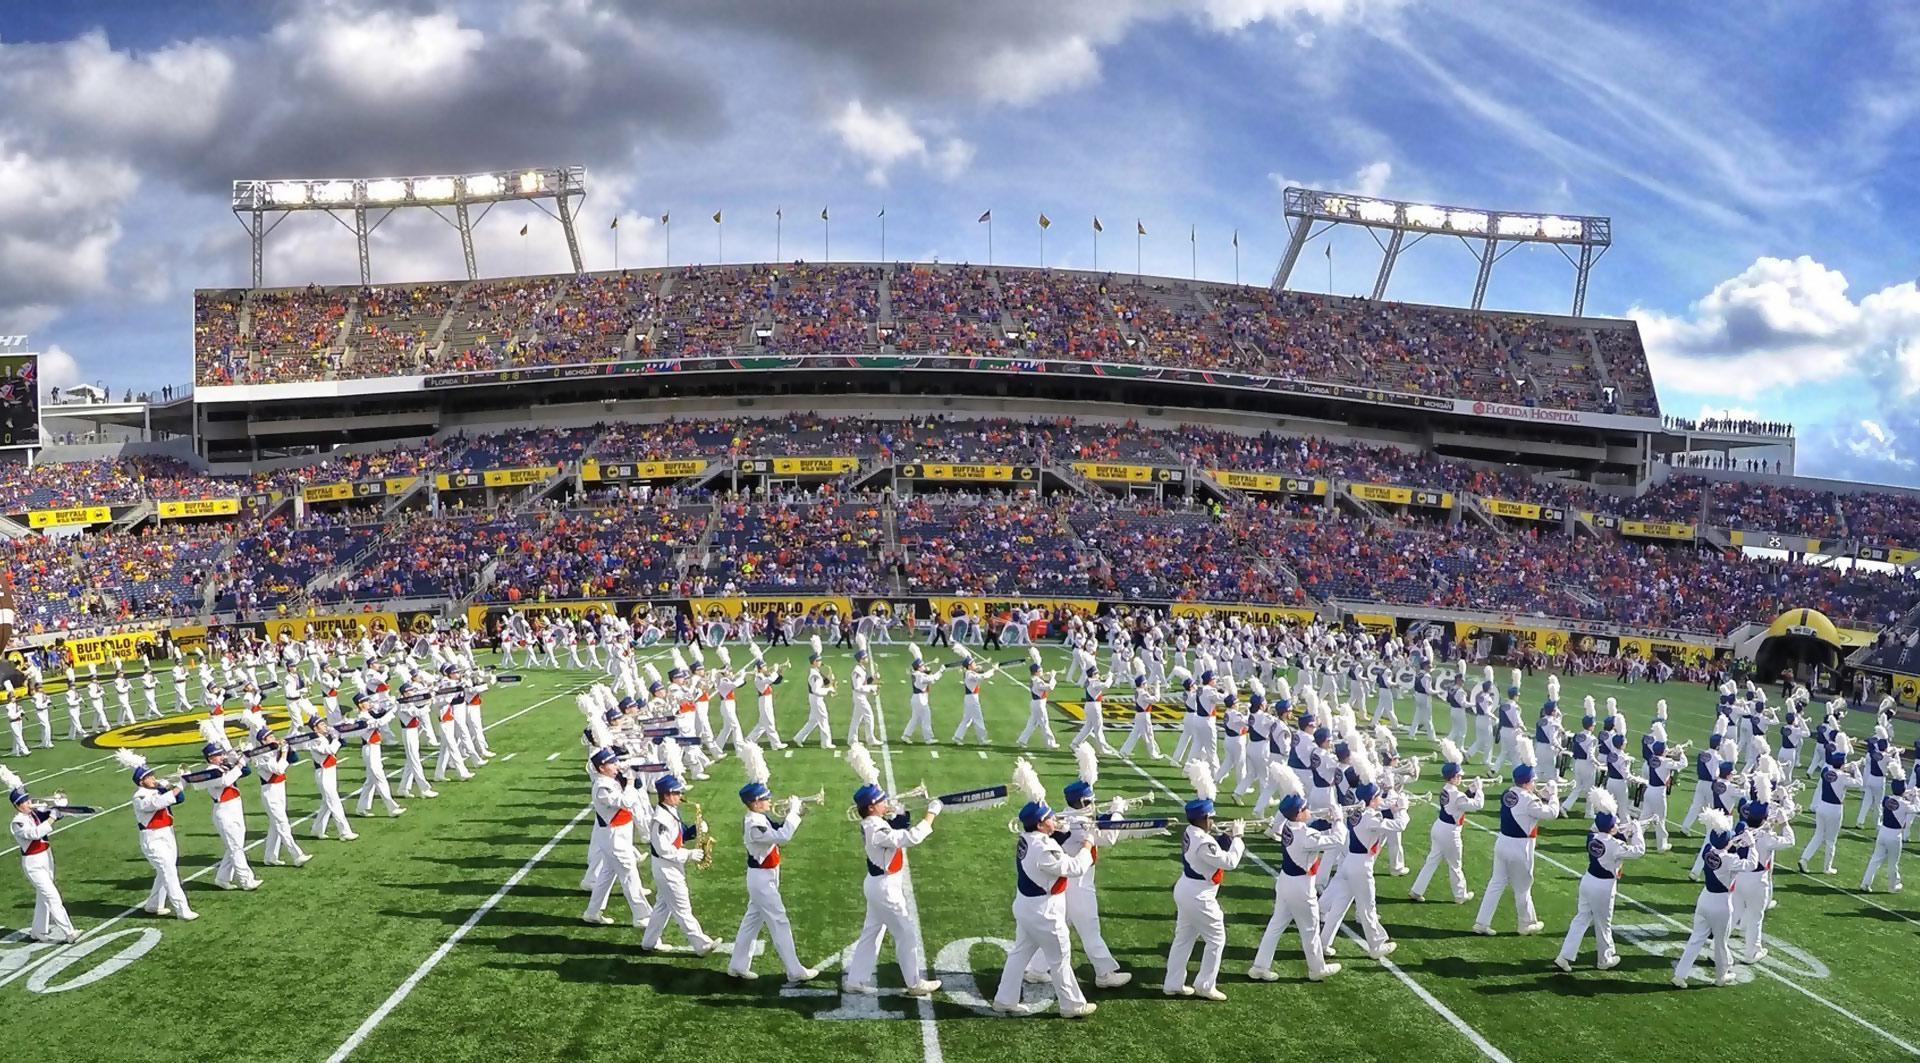 Camping World Stadium NFL Pro Bowl